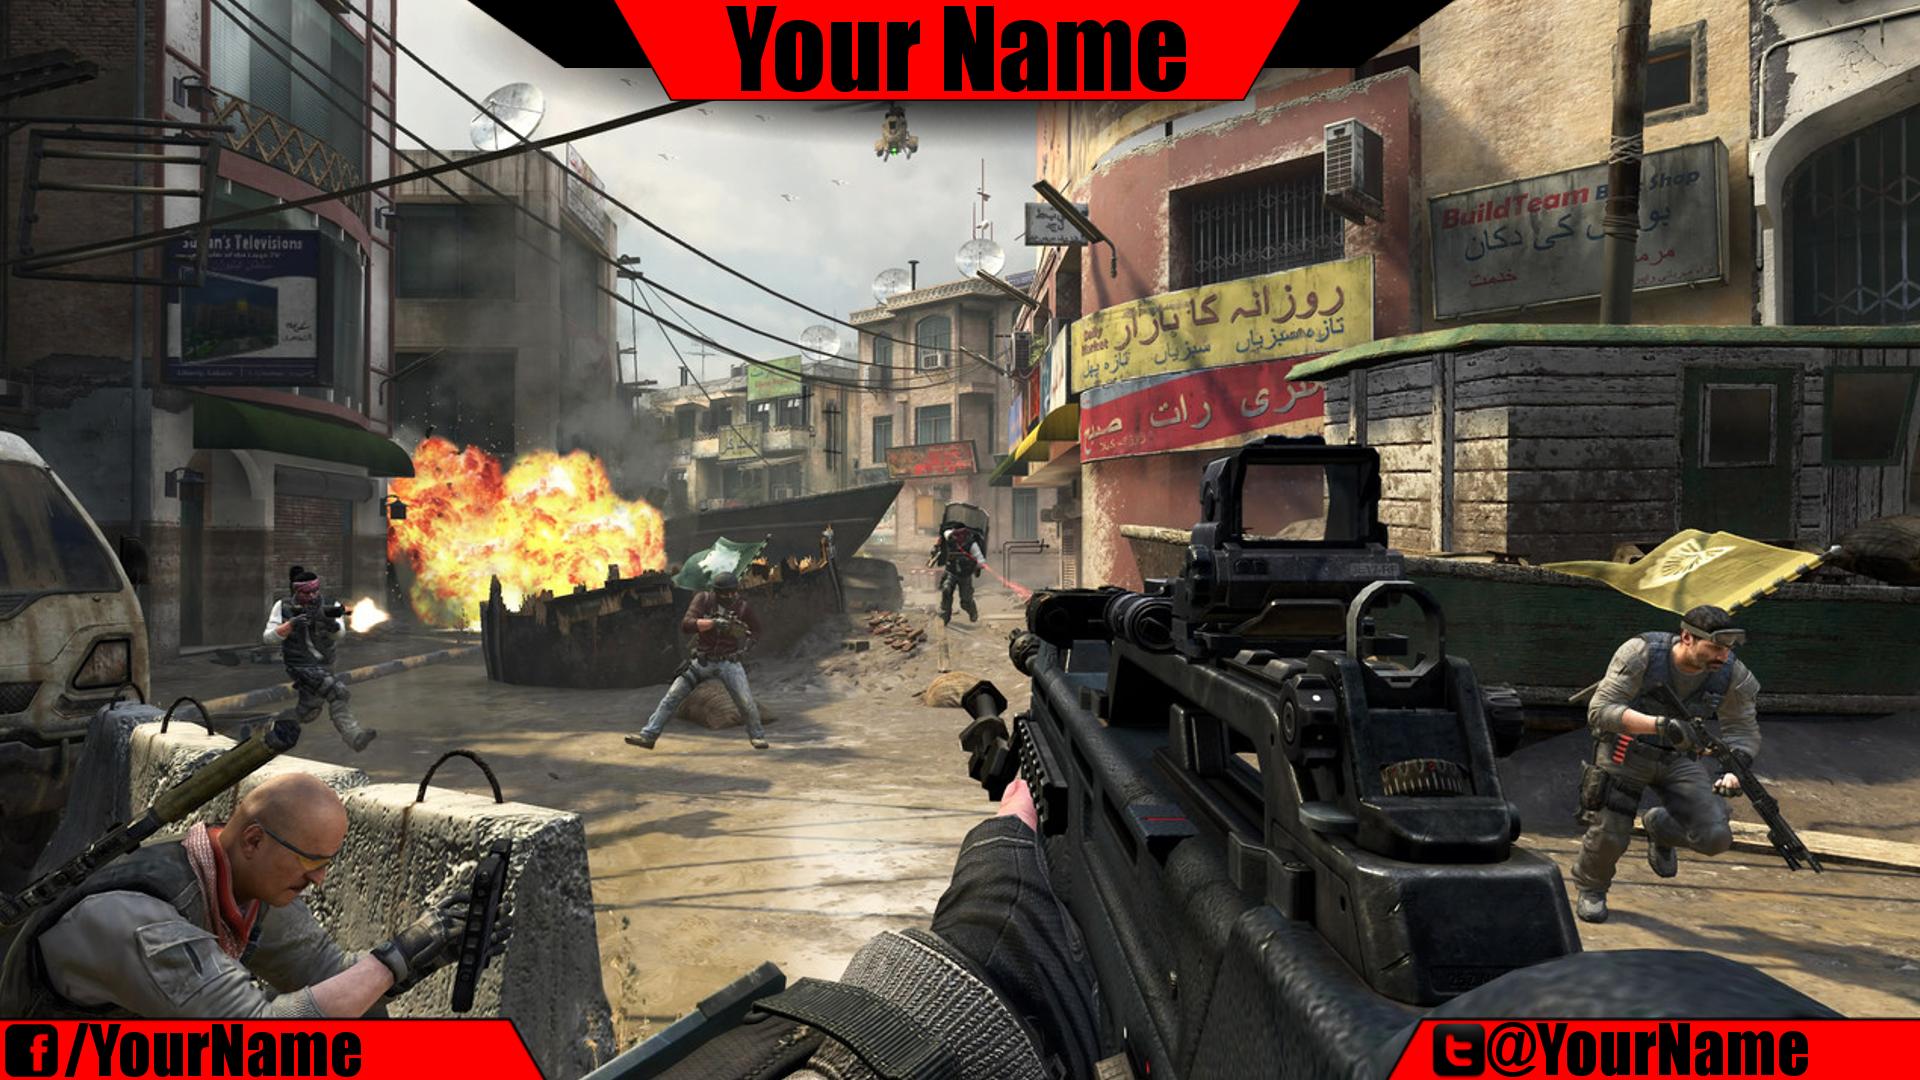 <b>Call</b> <b>of</b> <b>Duty</b>: Modern Warfare 3 - GameSpot